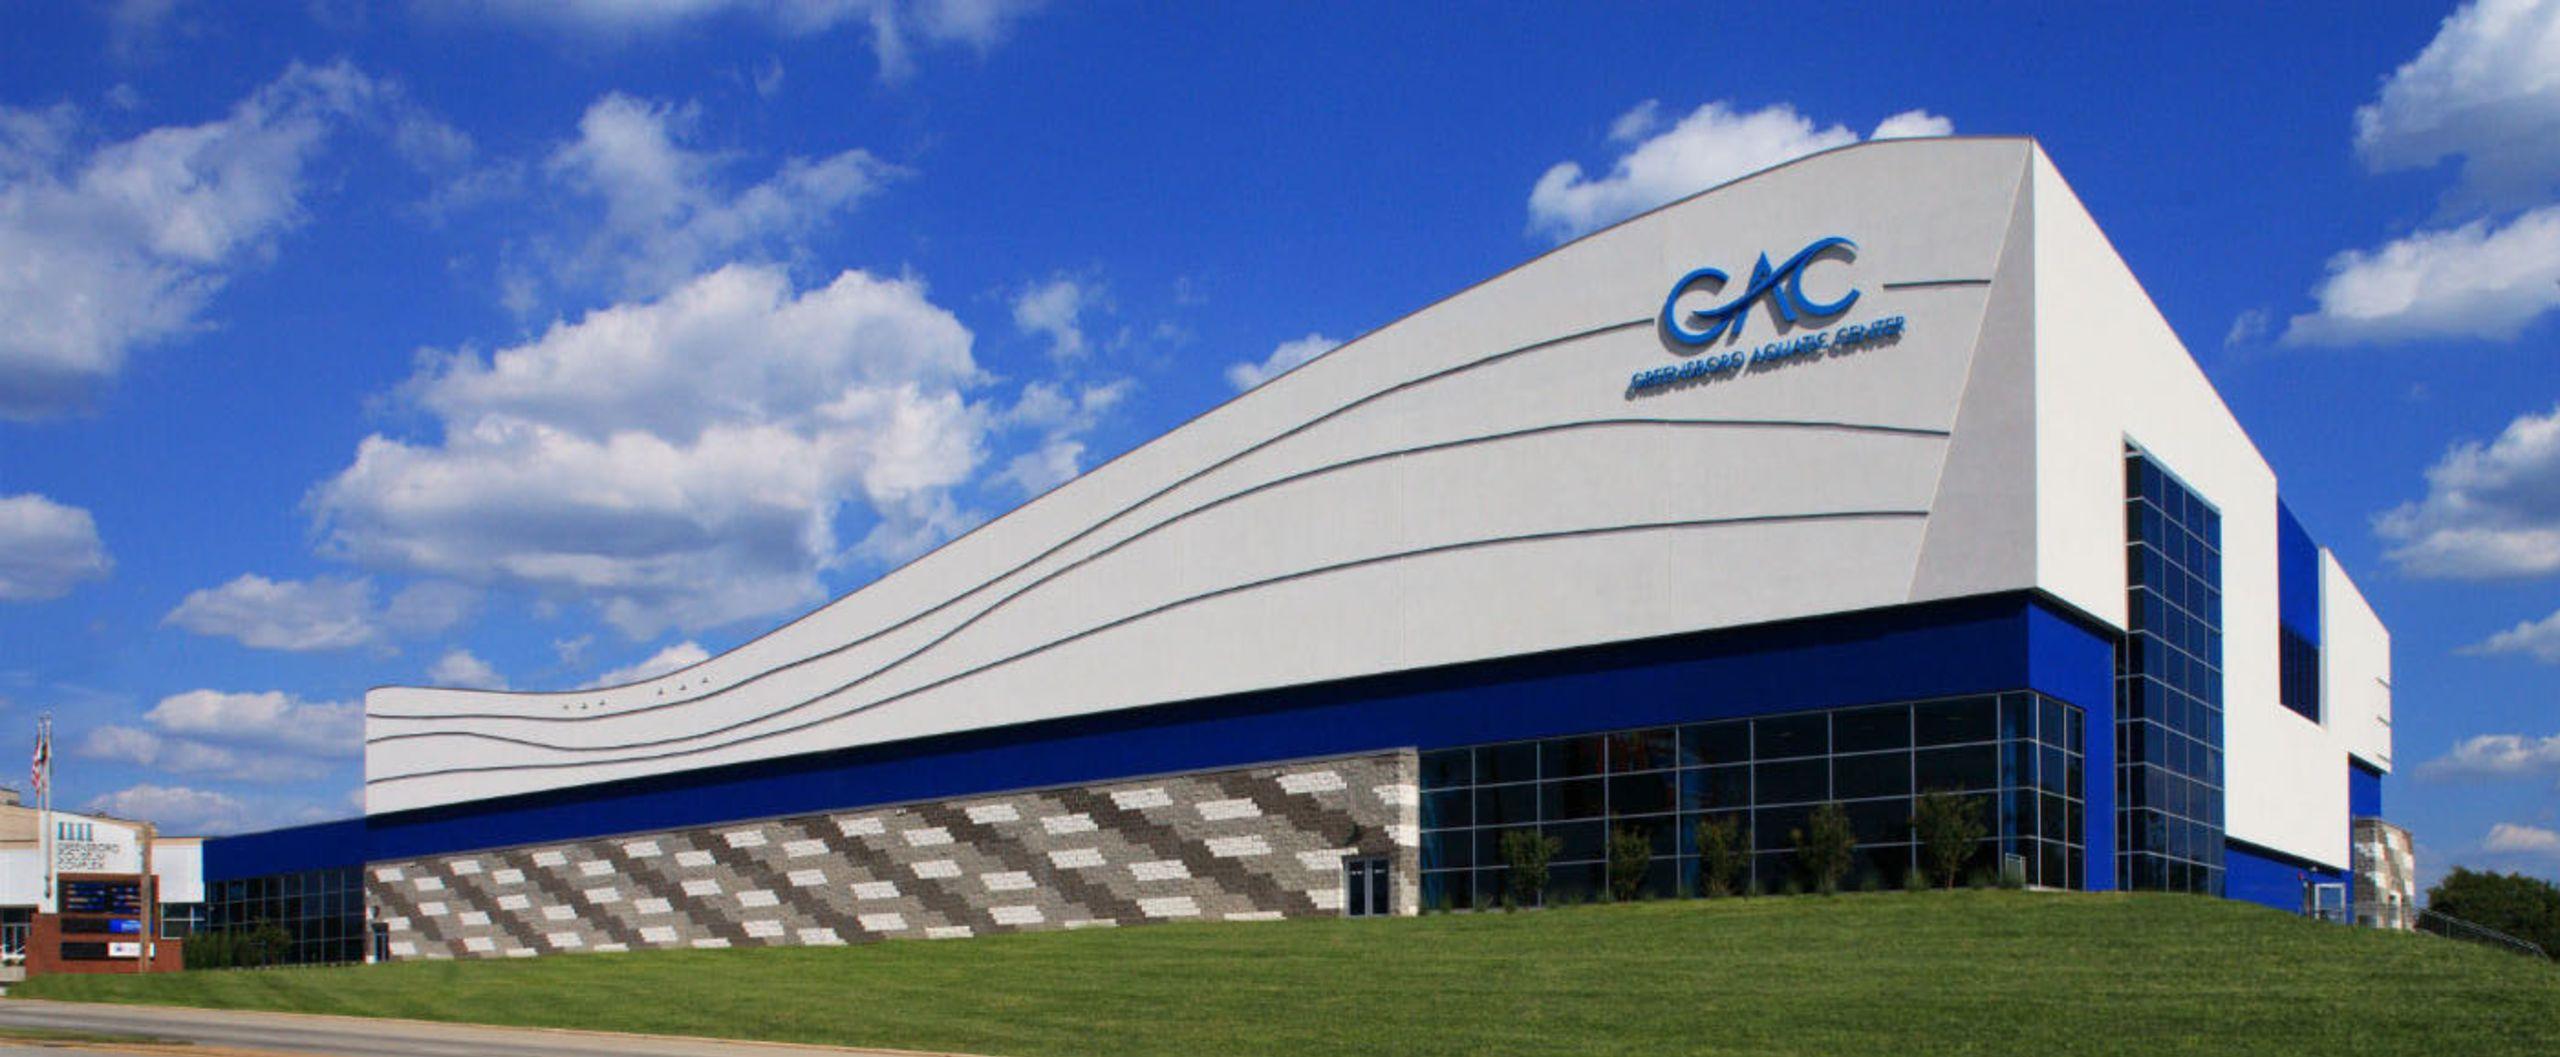 Greensboro Aquatic Center